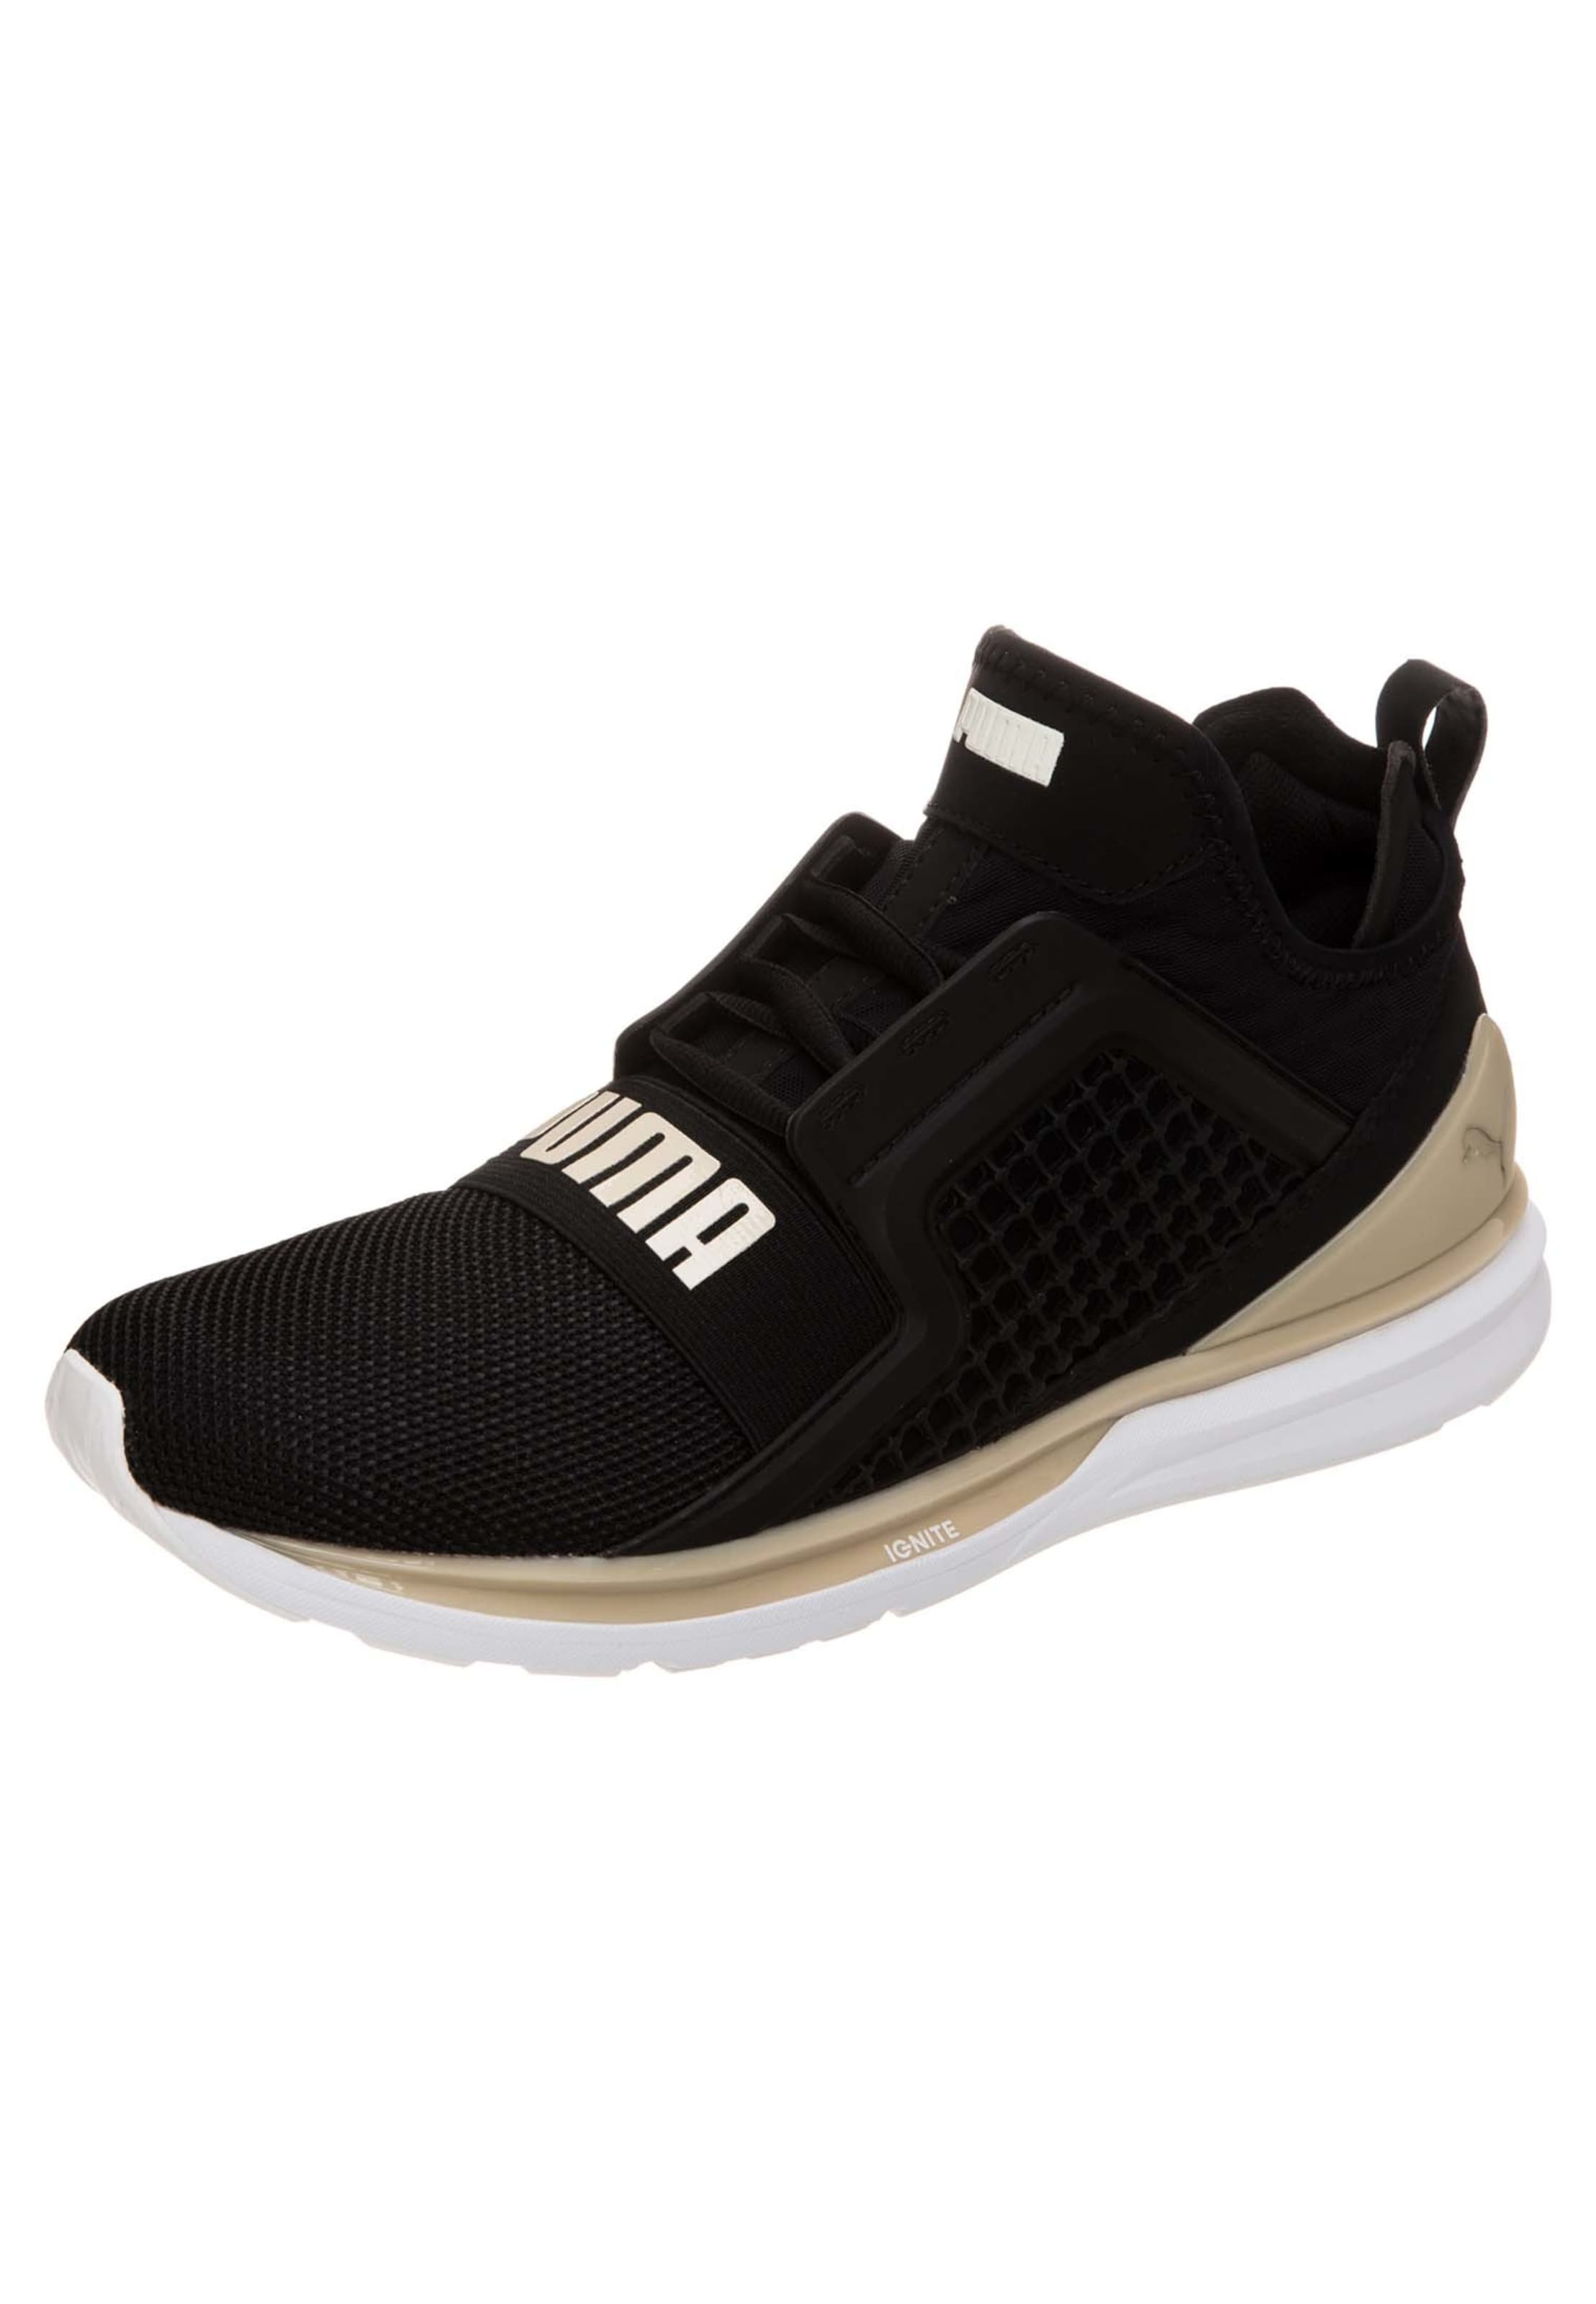 PUMA Sneaker Herren Ignite Limitless Knit nvdryr3883 Schuhe